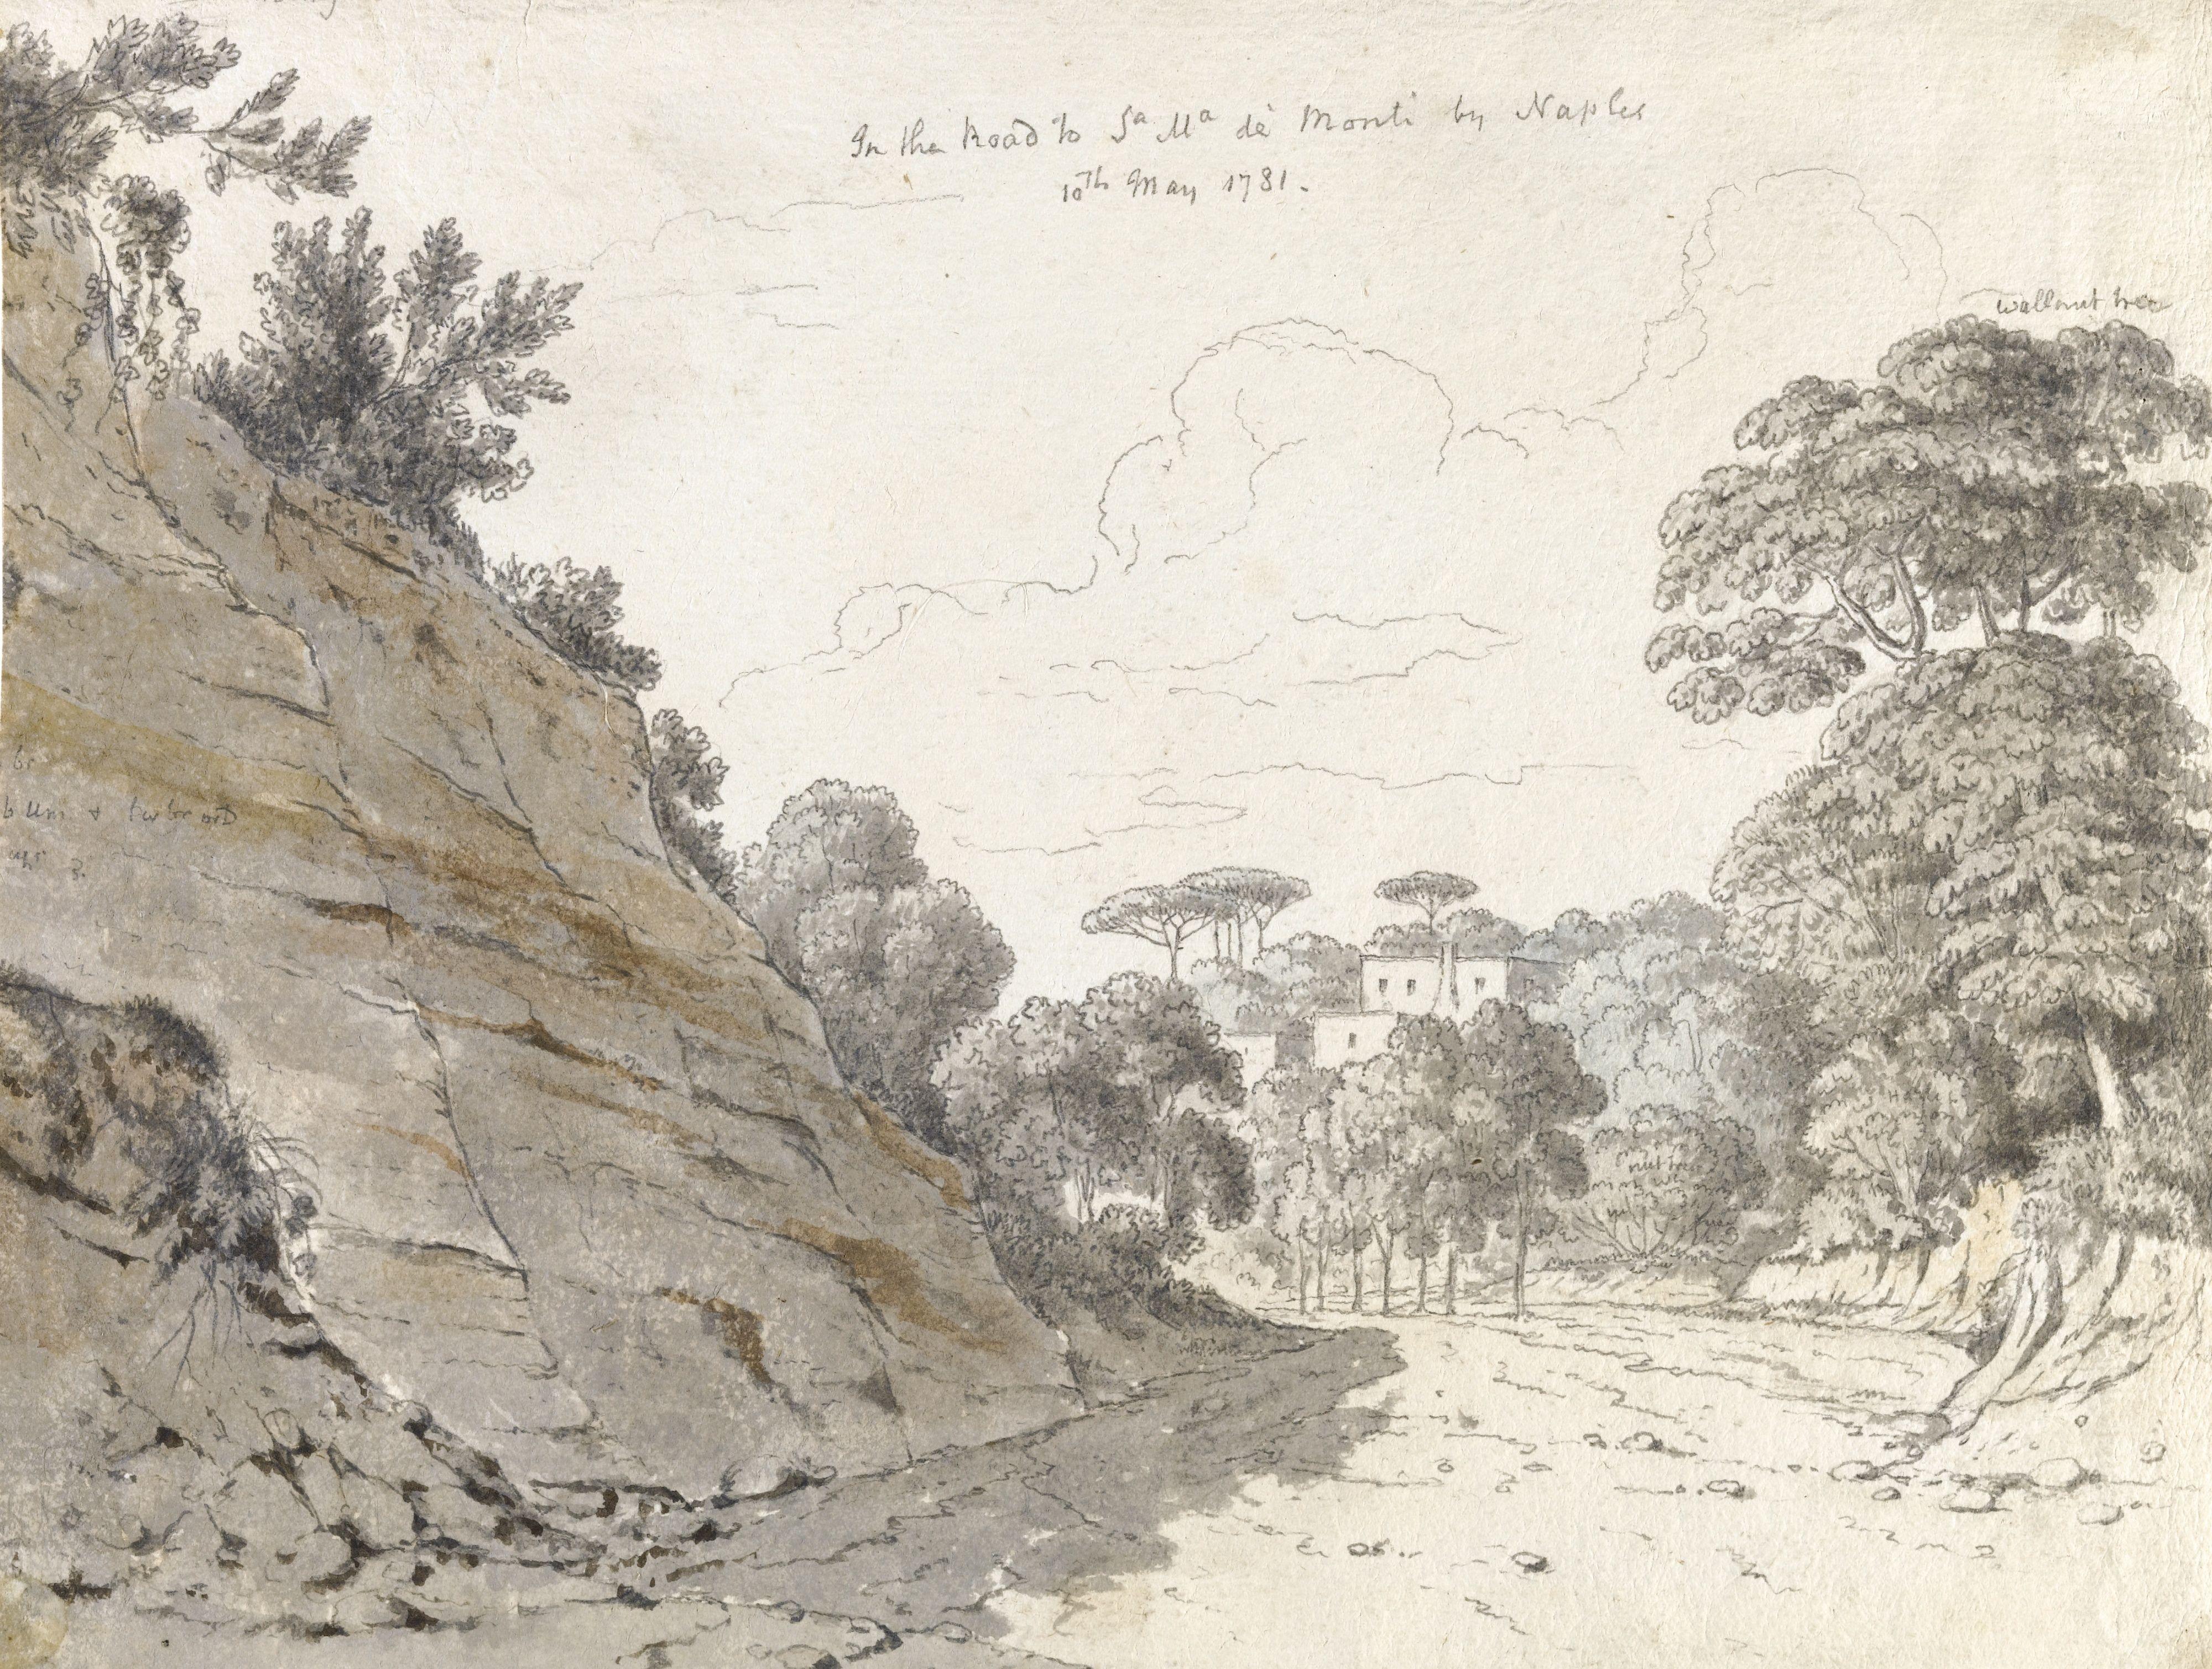 Thomas Jones Trefonnen Radnorshire 1742 1803 Carbach Road To Santa Maria Del Monte Naples Watercolour Over Pencil On L Thomas Jones Artwork Images Landscape